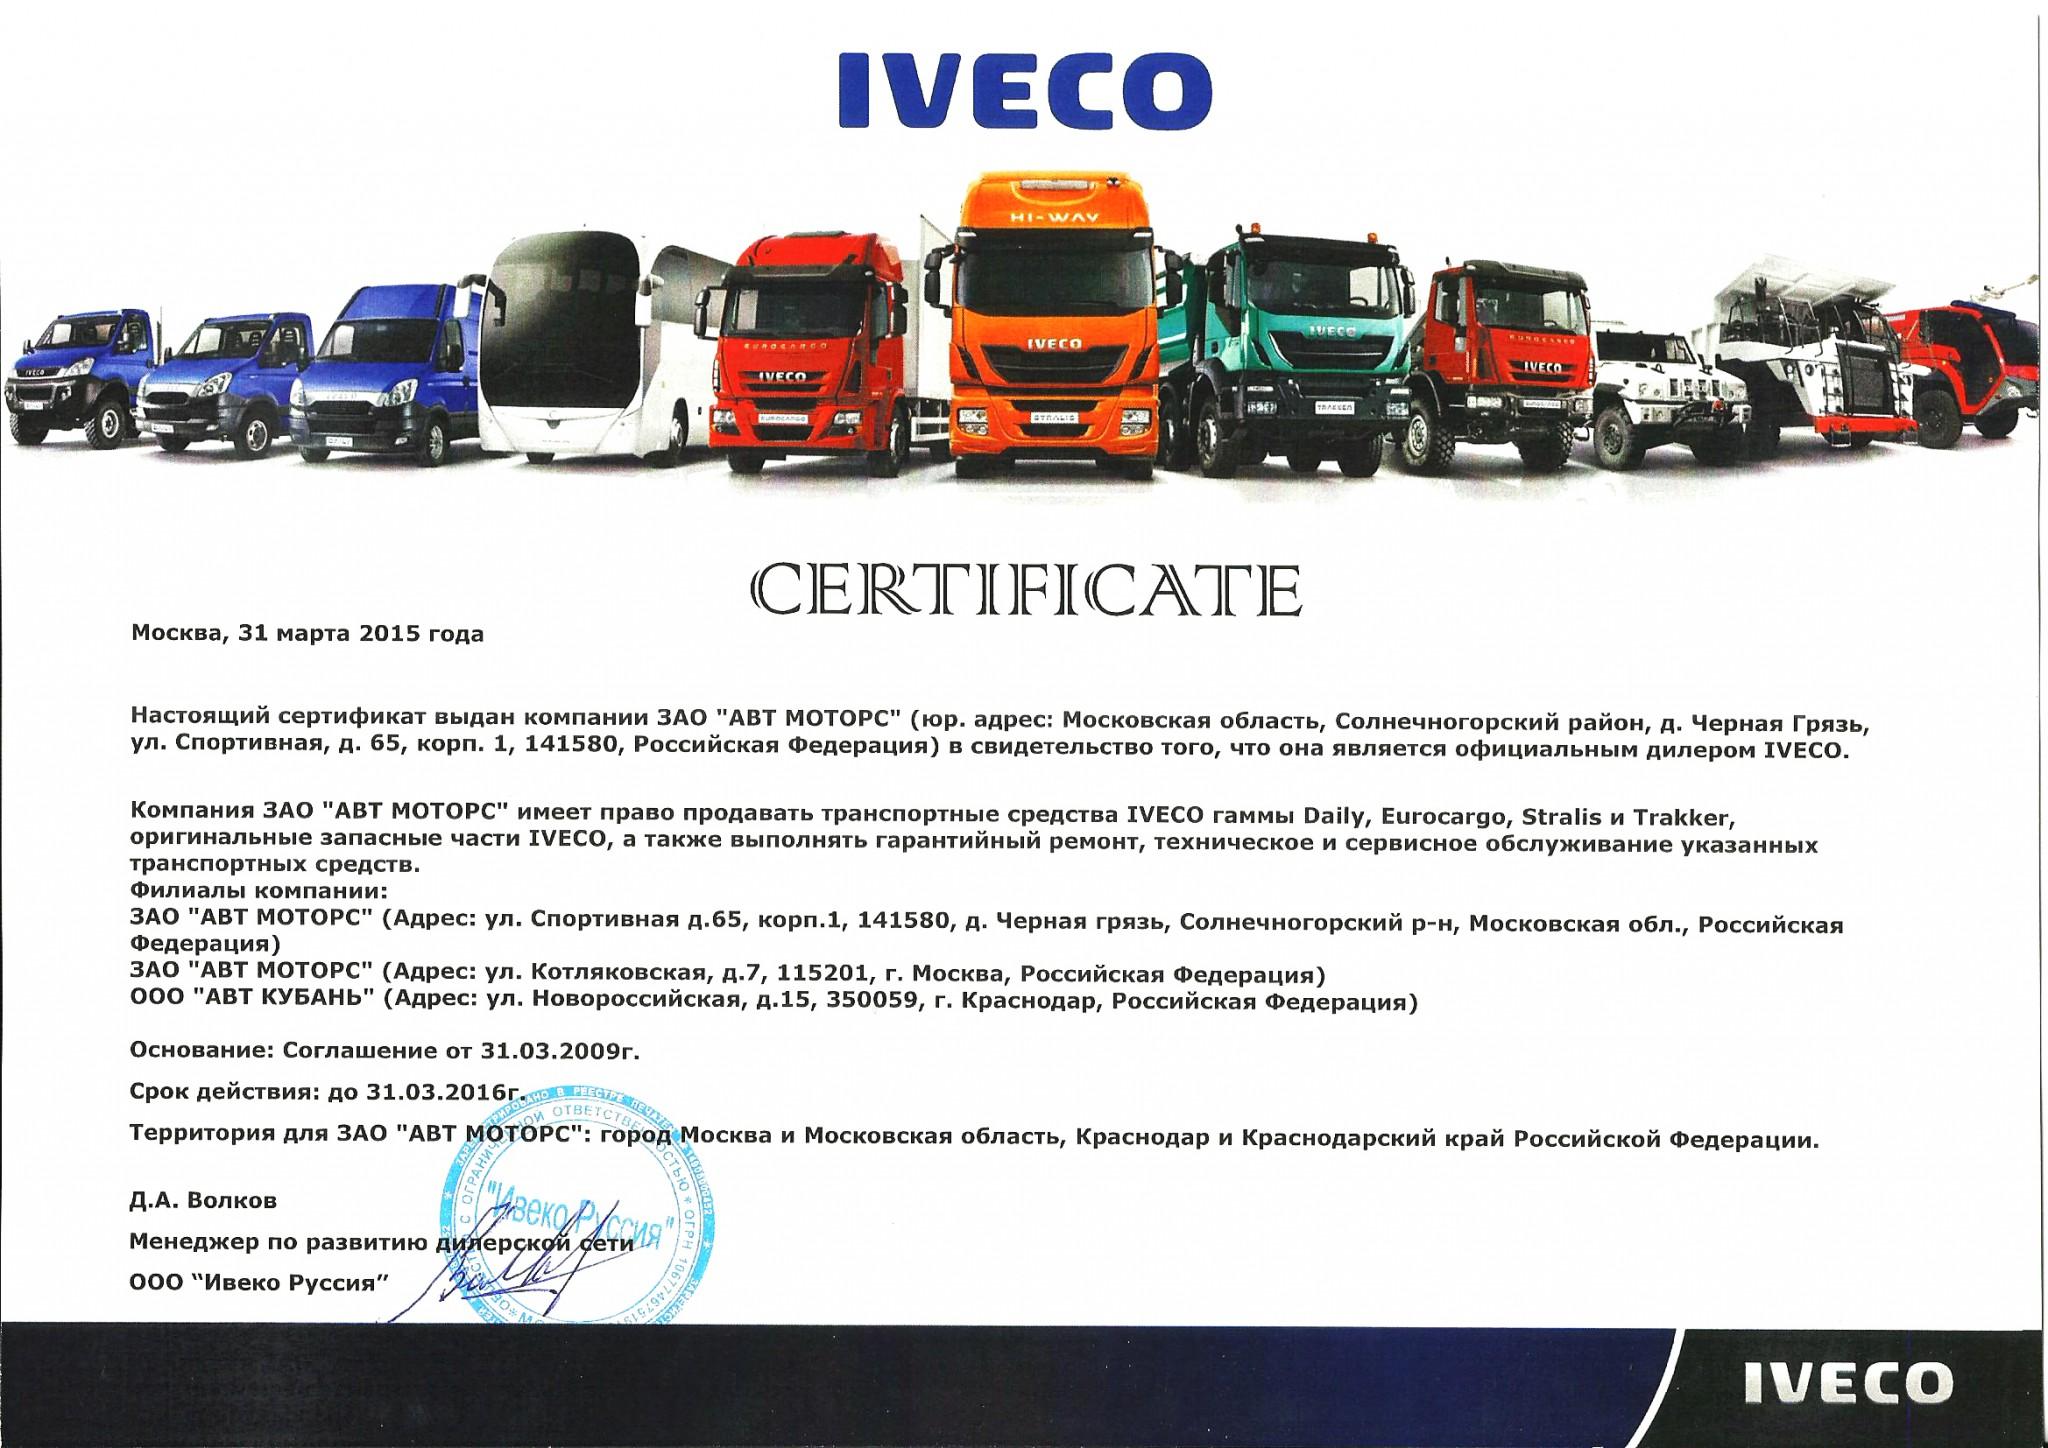 Сертификат дилерского центра IVECO